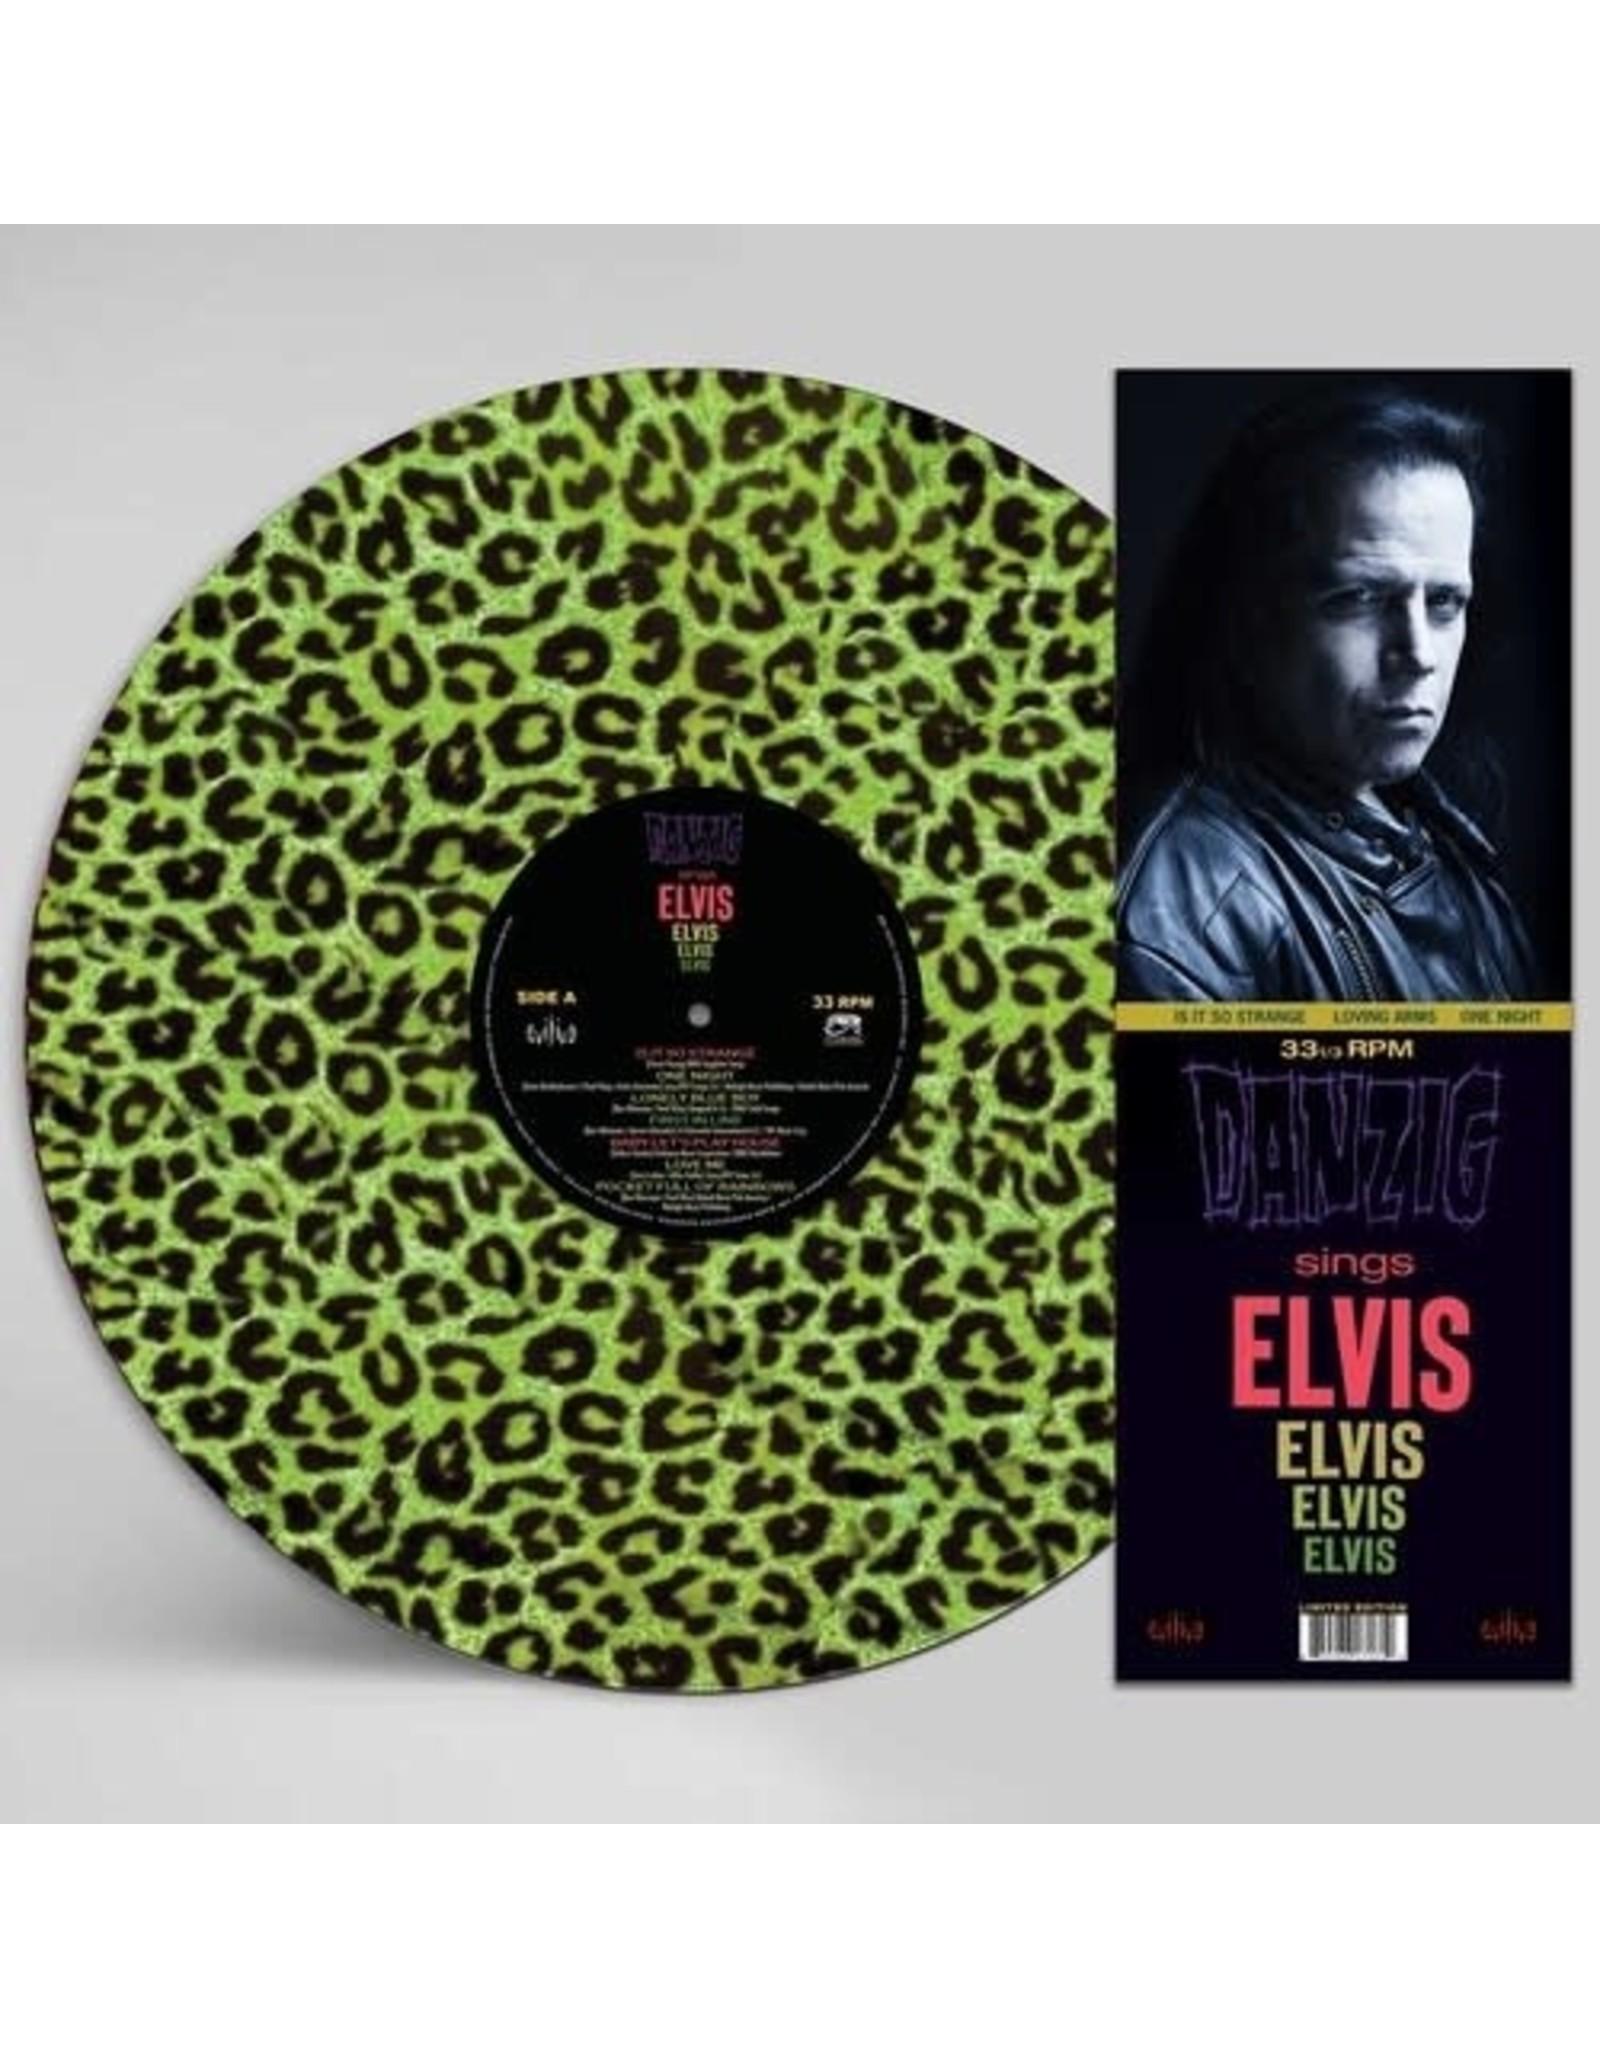 Danzig - Sings Elvis (Green Leopard Print Picture Disc)